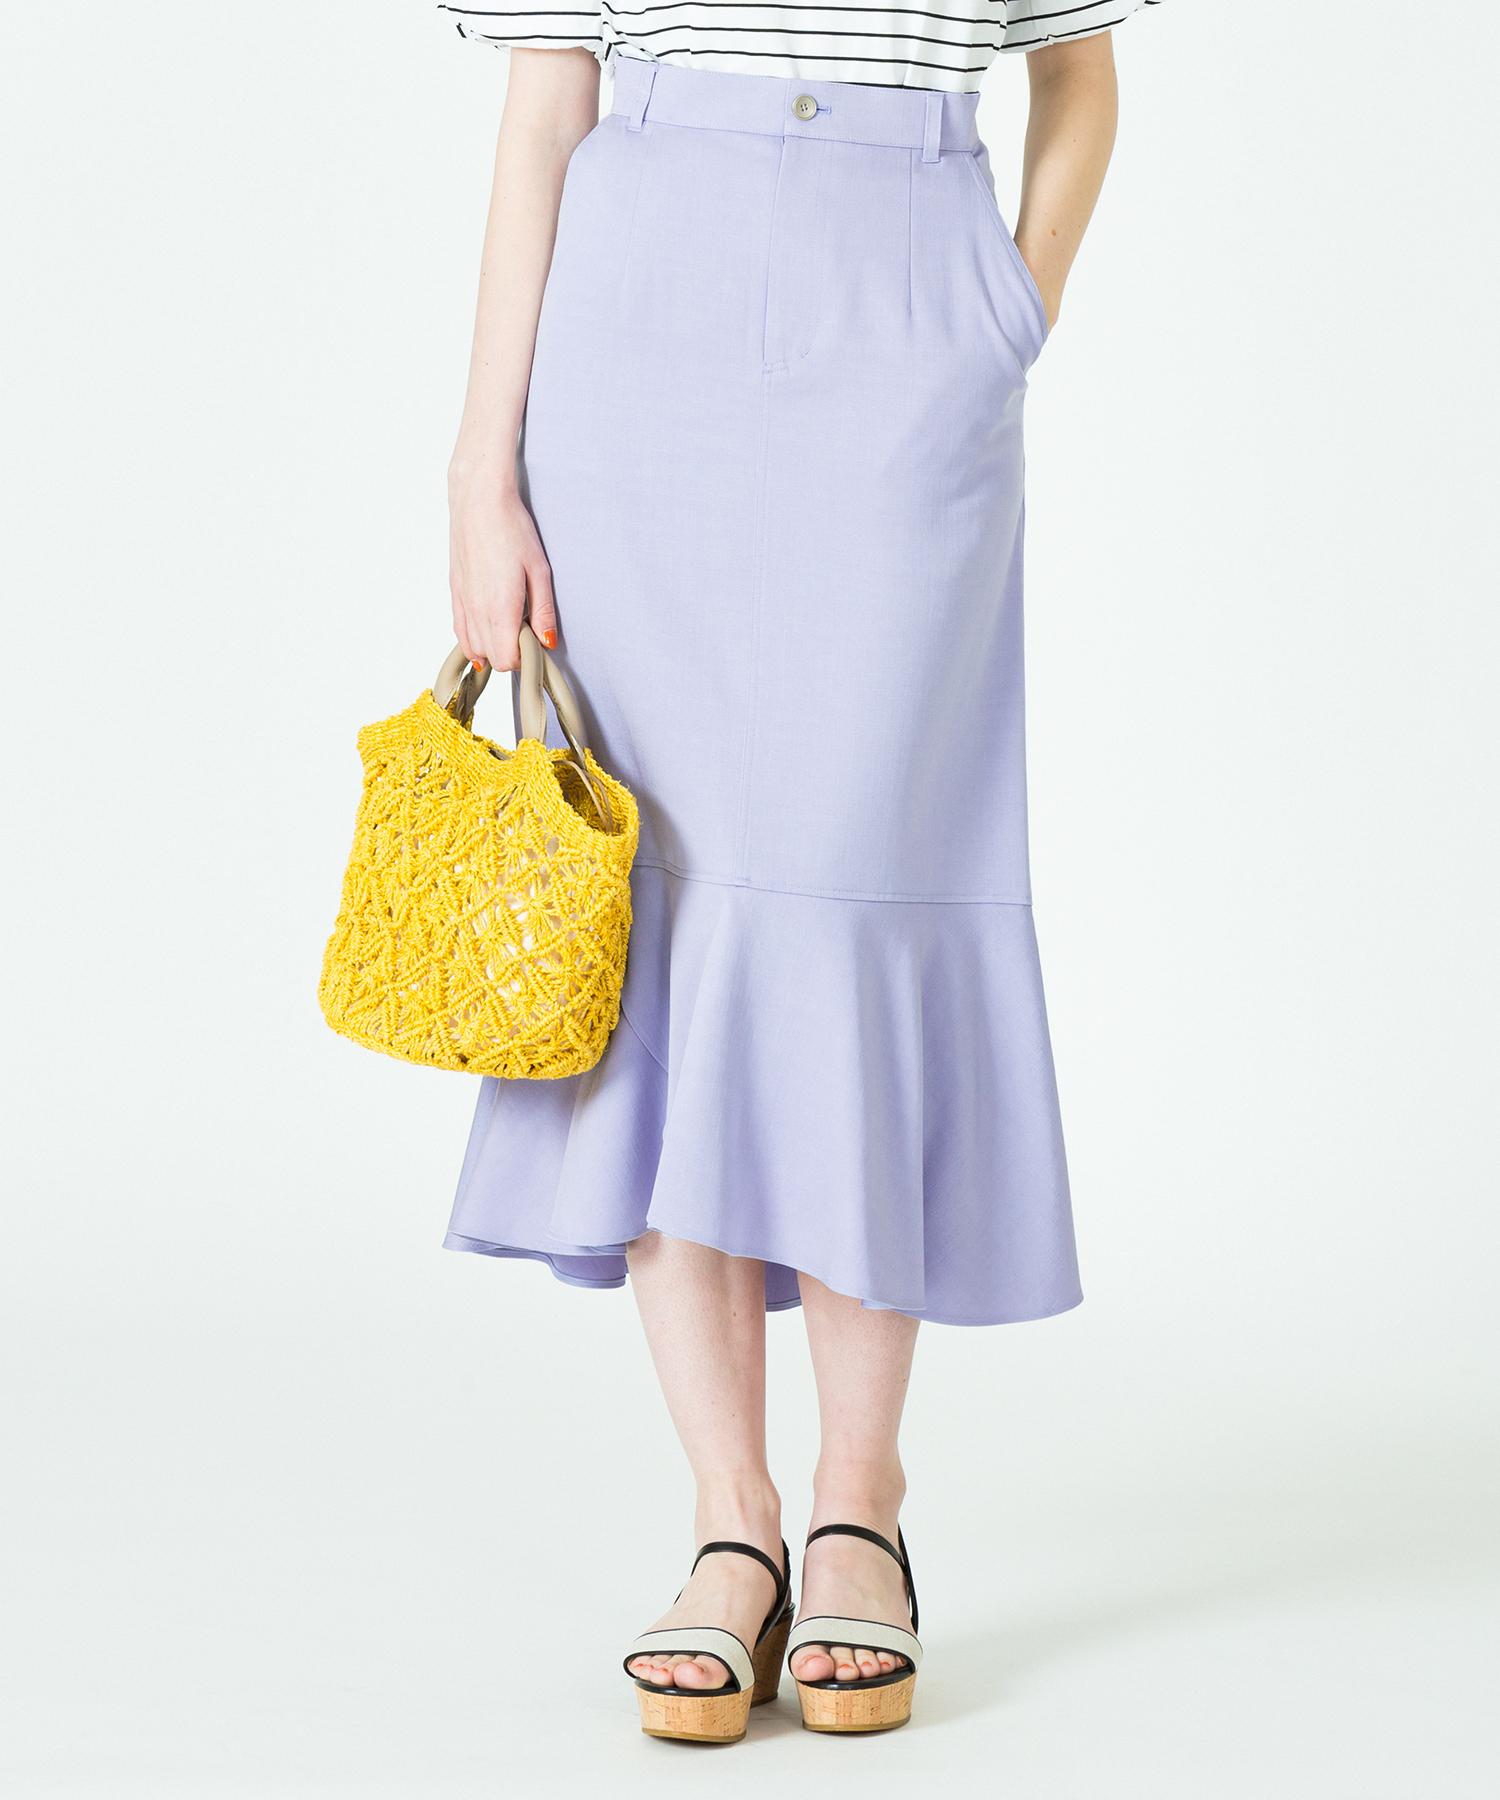 【LOULOU WILLOUGHBY】 デニムロングペプラムスカート